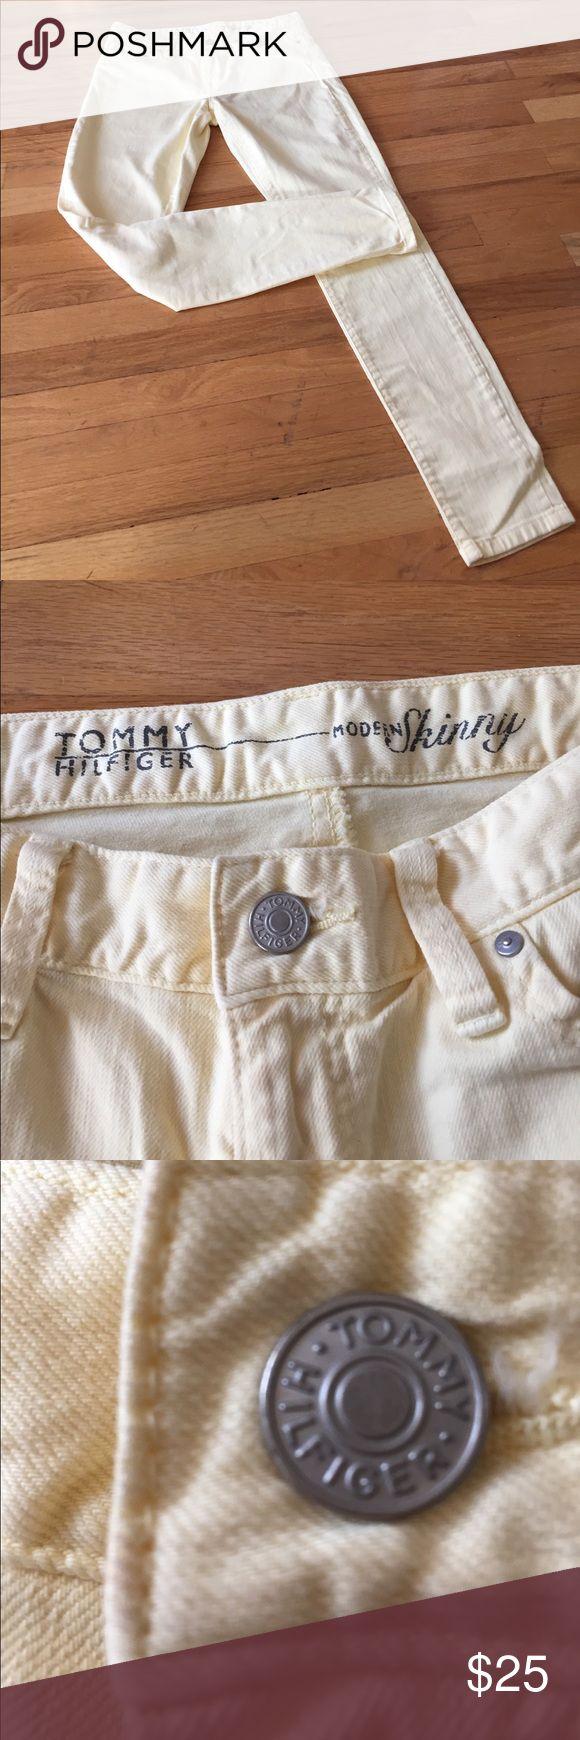 "Tommy Hilfiger modern skinny jean 30X30 8"" rise Pale yellow skinny jeans 30x30"" Tommy Hilfiger Jeans Skinny"